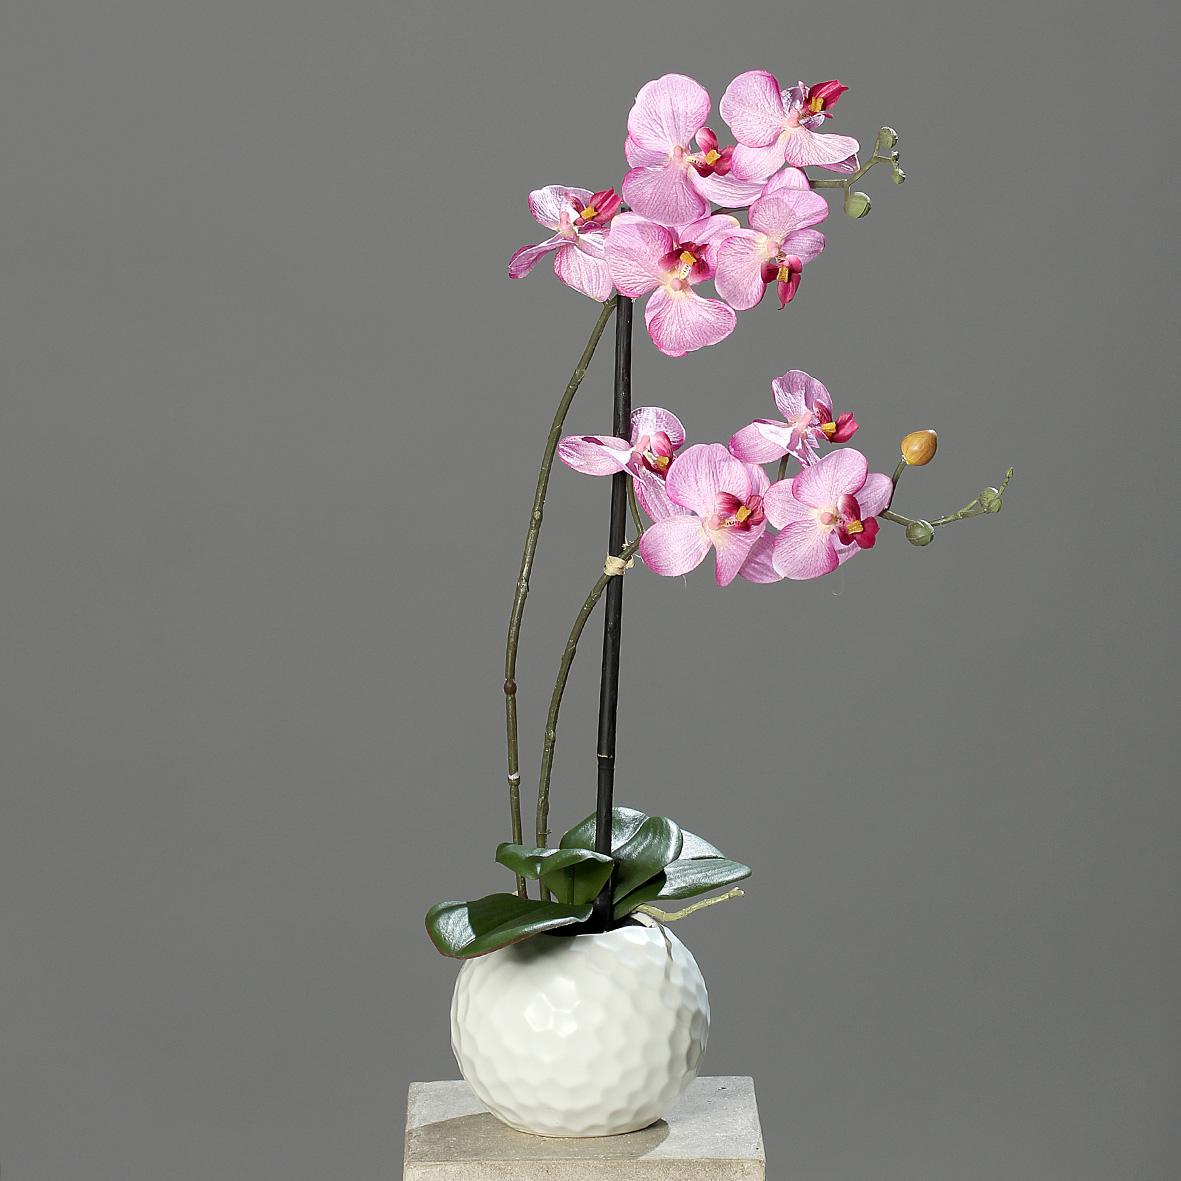 Orchidee in Kugelvase Keramik Kunstpflanze 2 Rispen pink 55cm